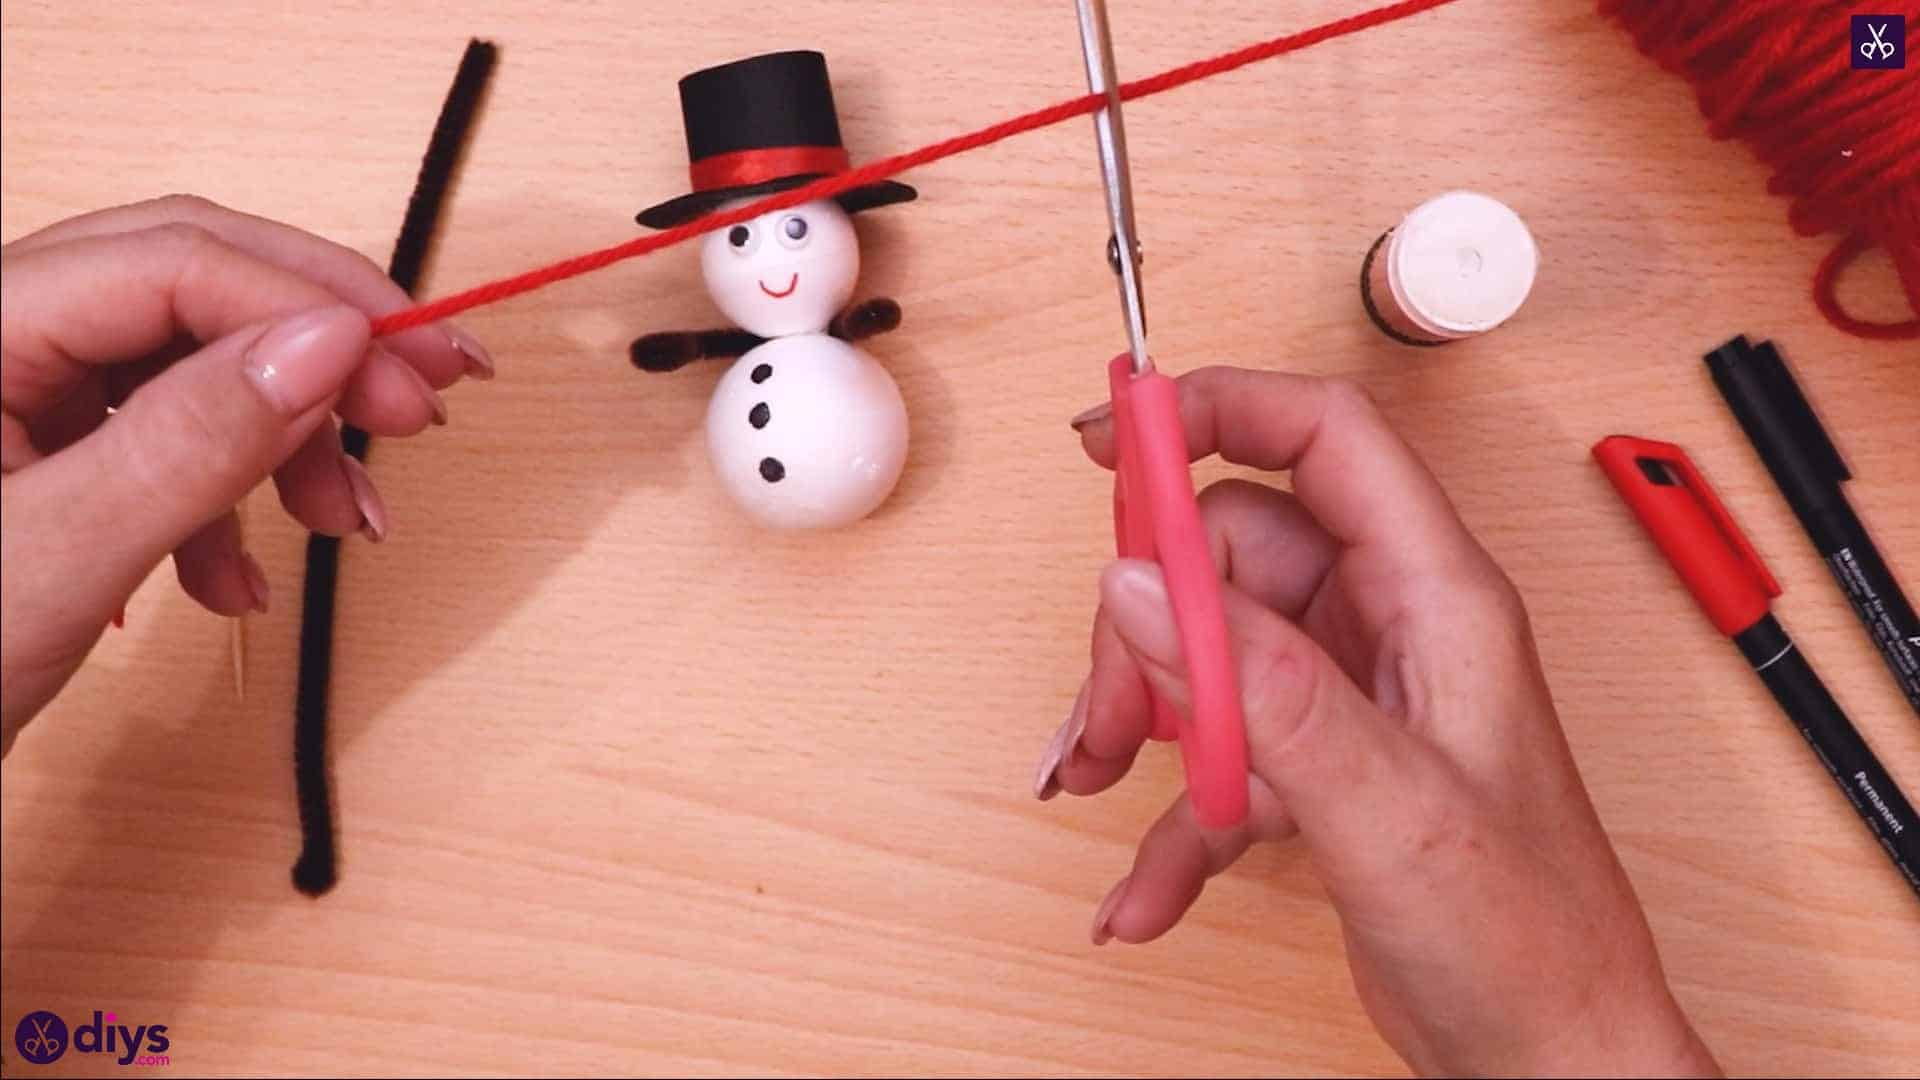 Styrofoam snowman cut